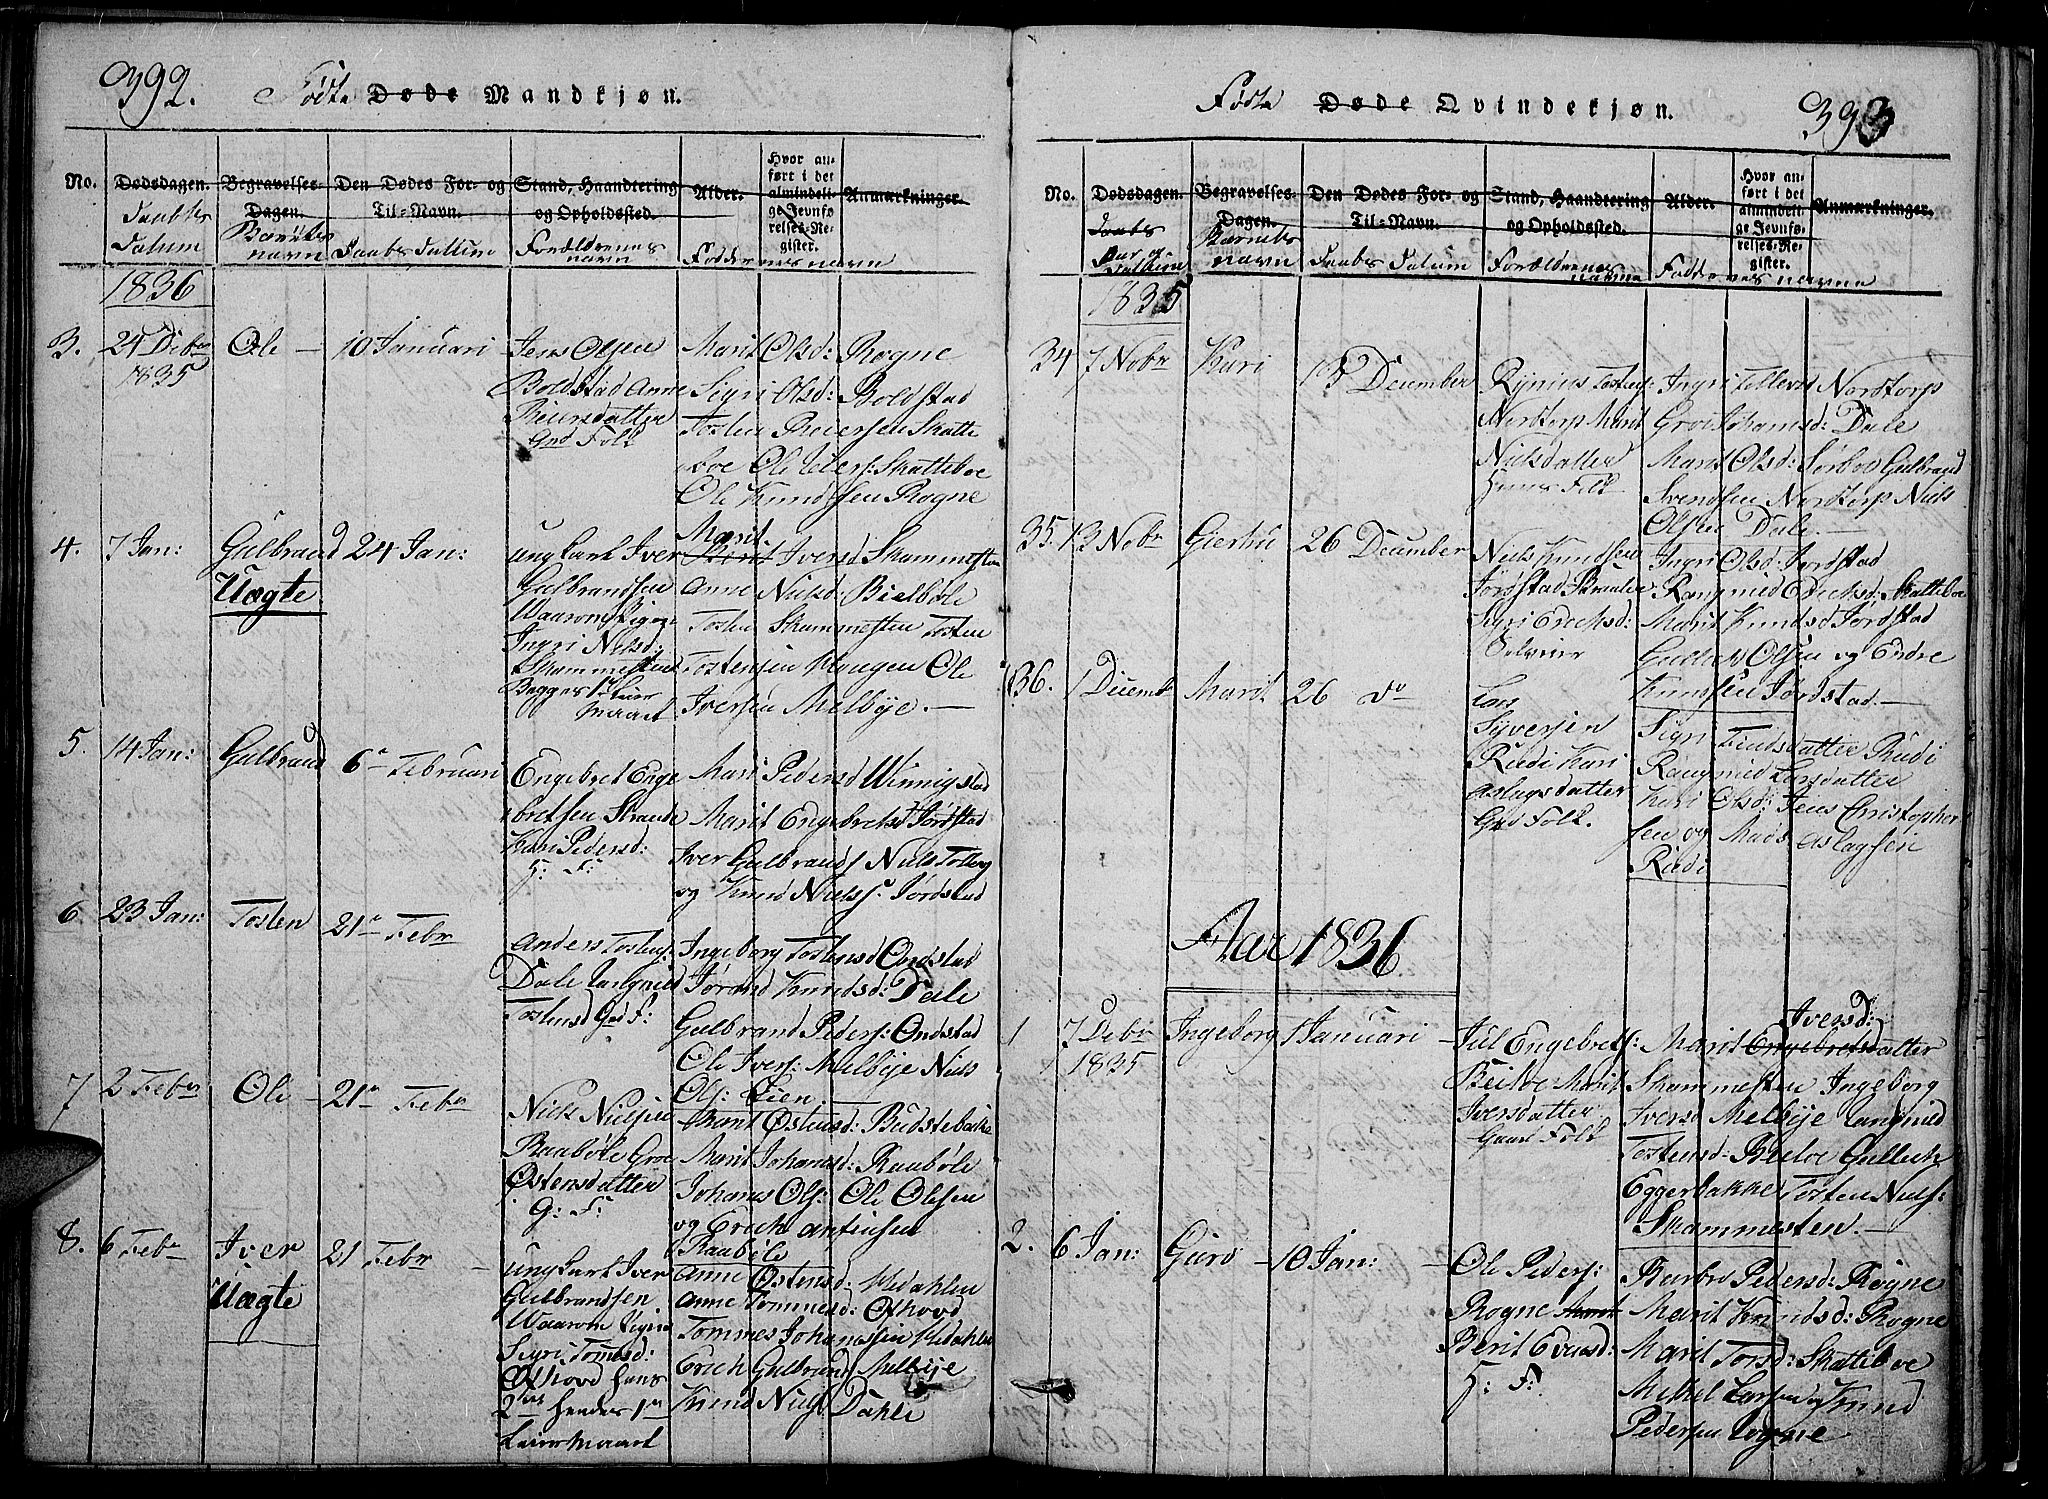 SAH, Slidre prestekontor, Klokkerbok nr. 2, 1814-1839, s. 392-393